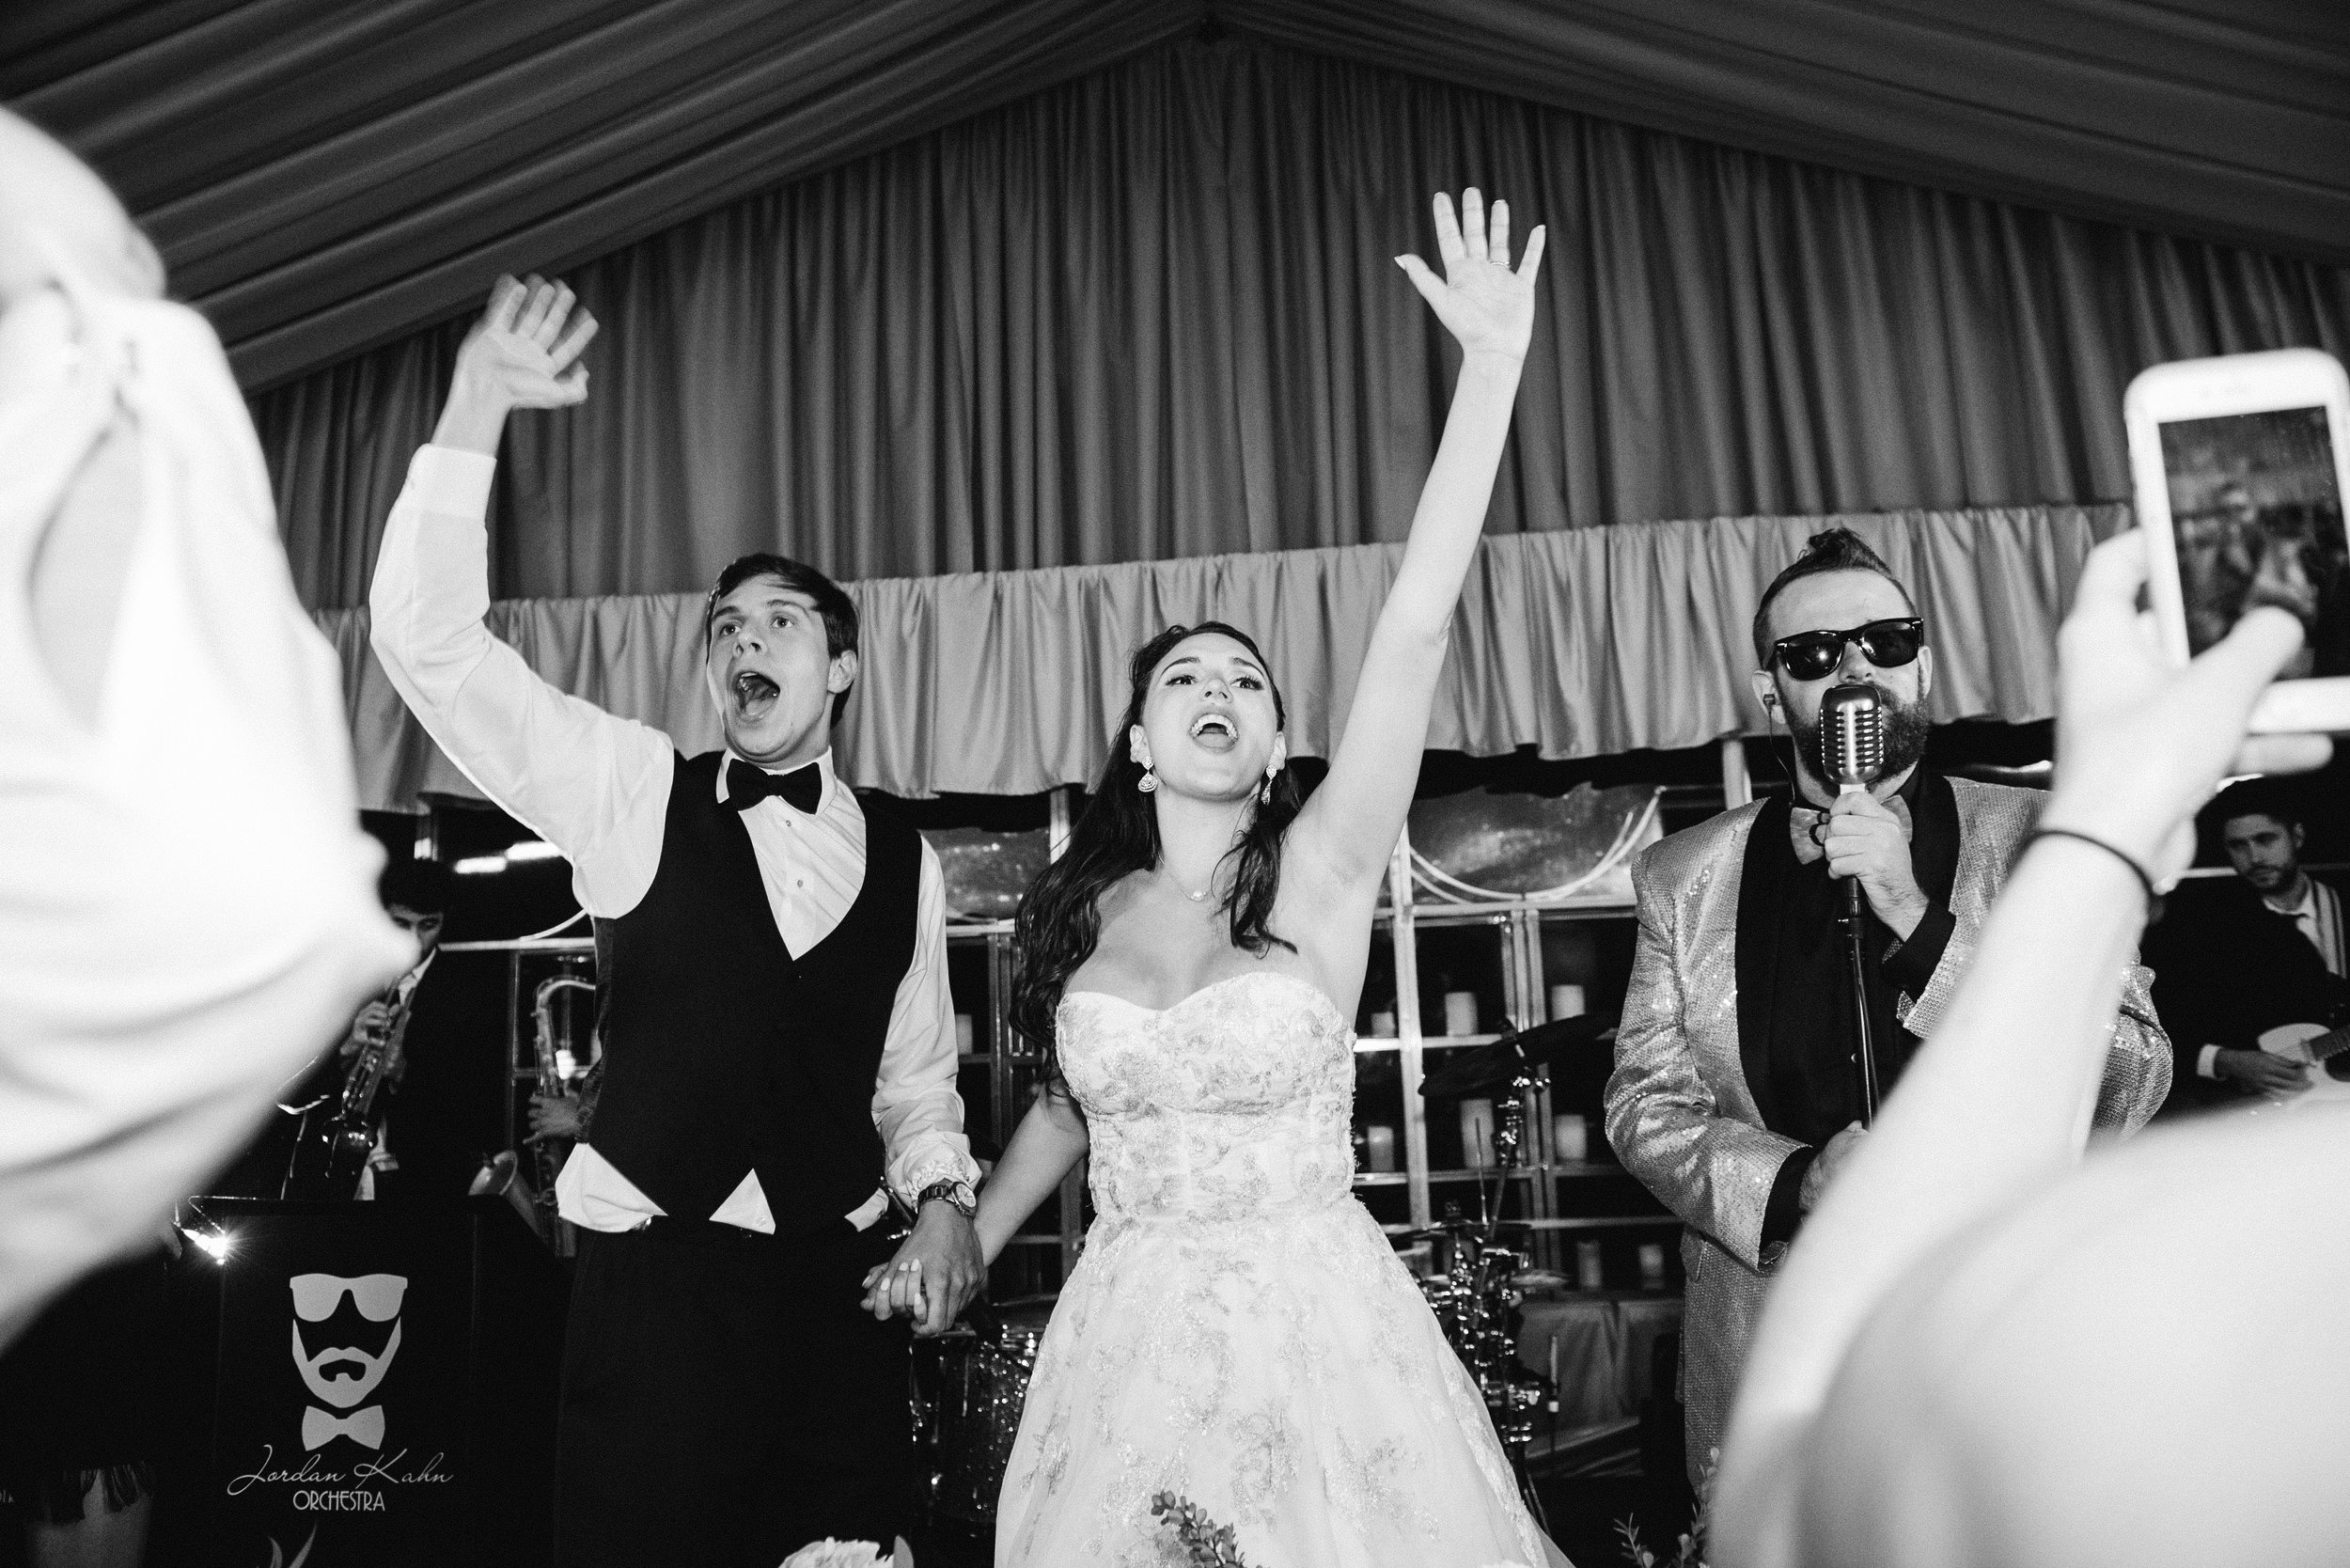 Dancing Details - Dallas, Tx - Spring Wedding - Julian Leaver Events